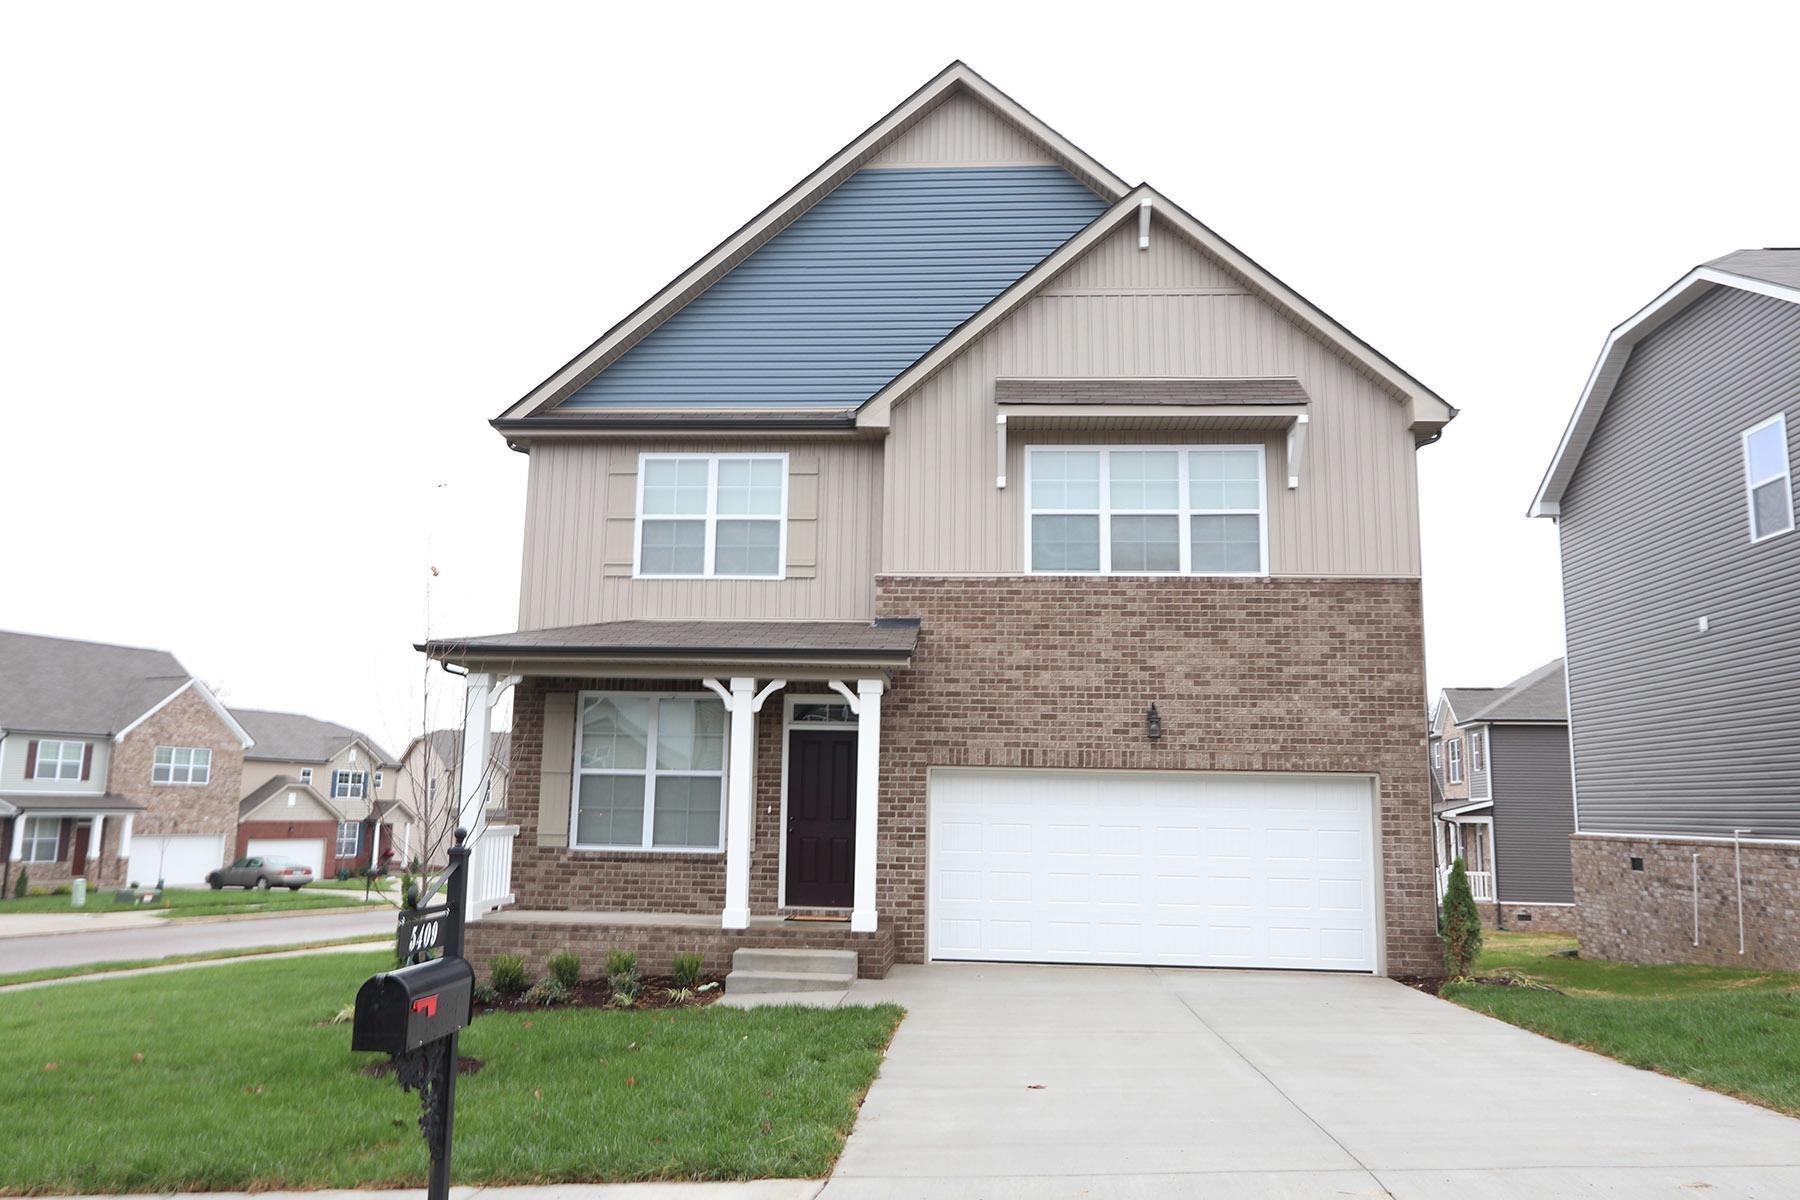 607 Green Meadow Lane Lot 81, Smyrna, TN 37167 - Smyrna, TN real estate listing